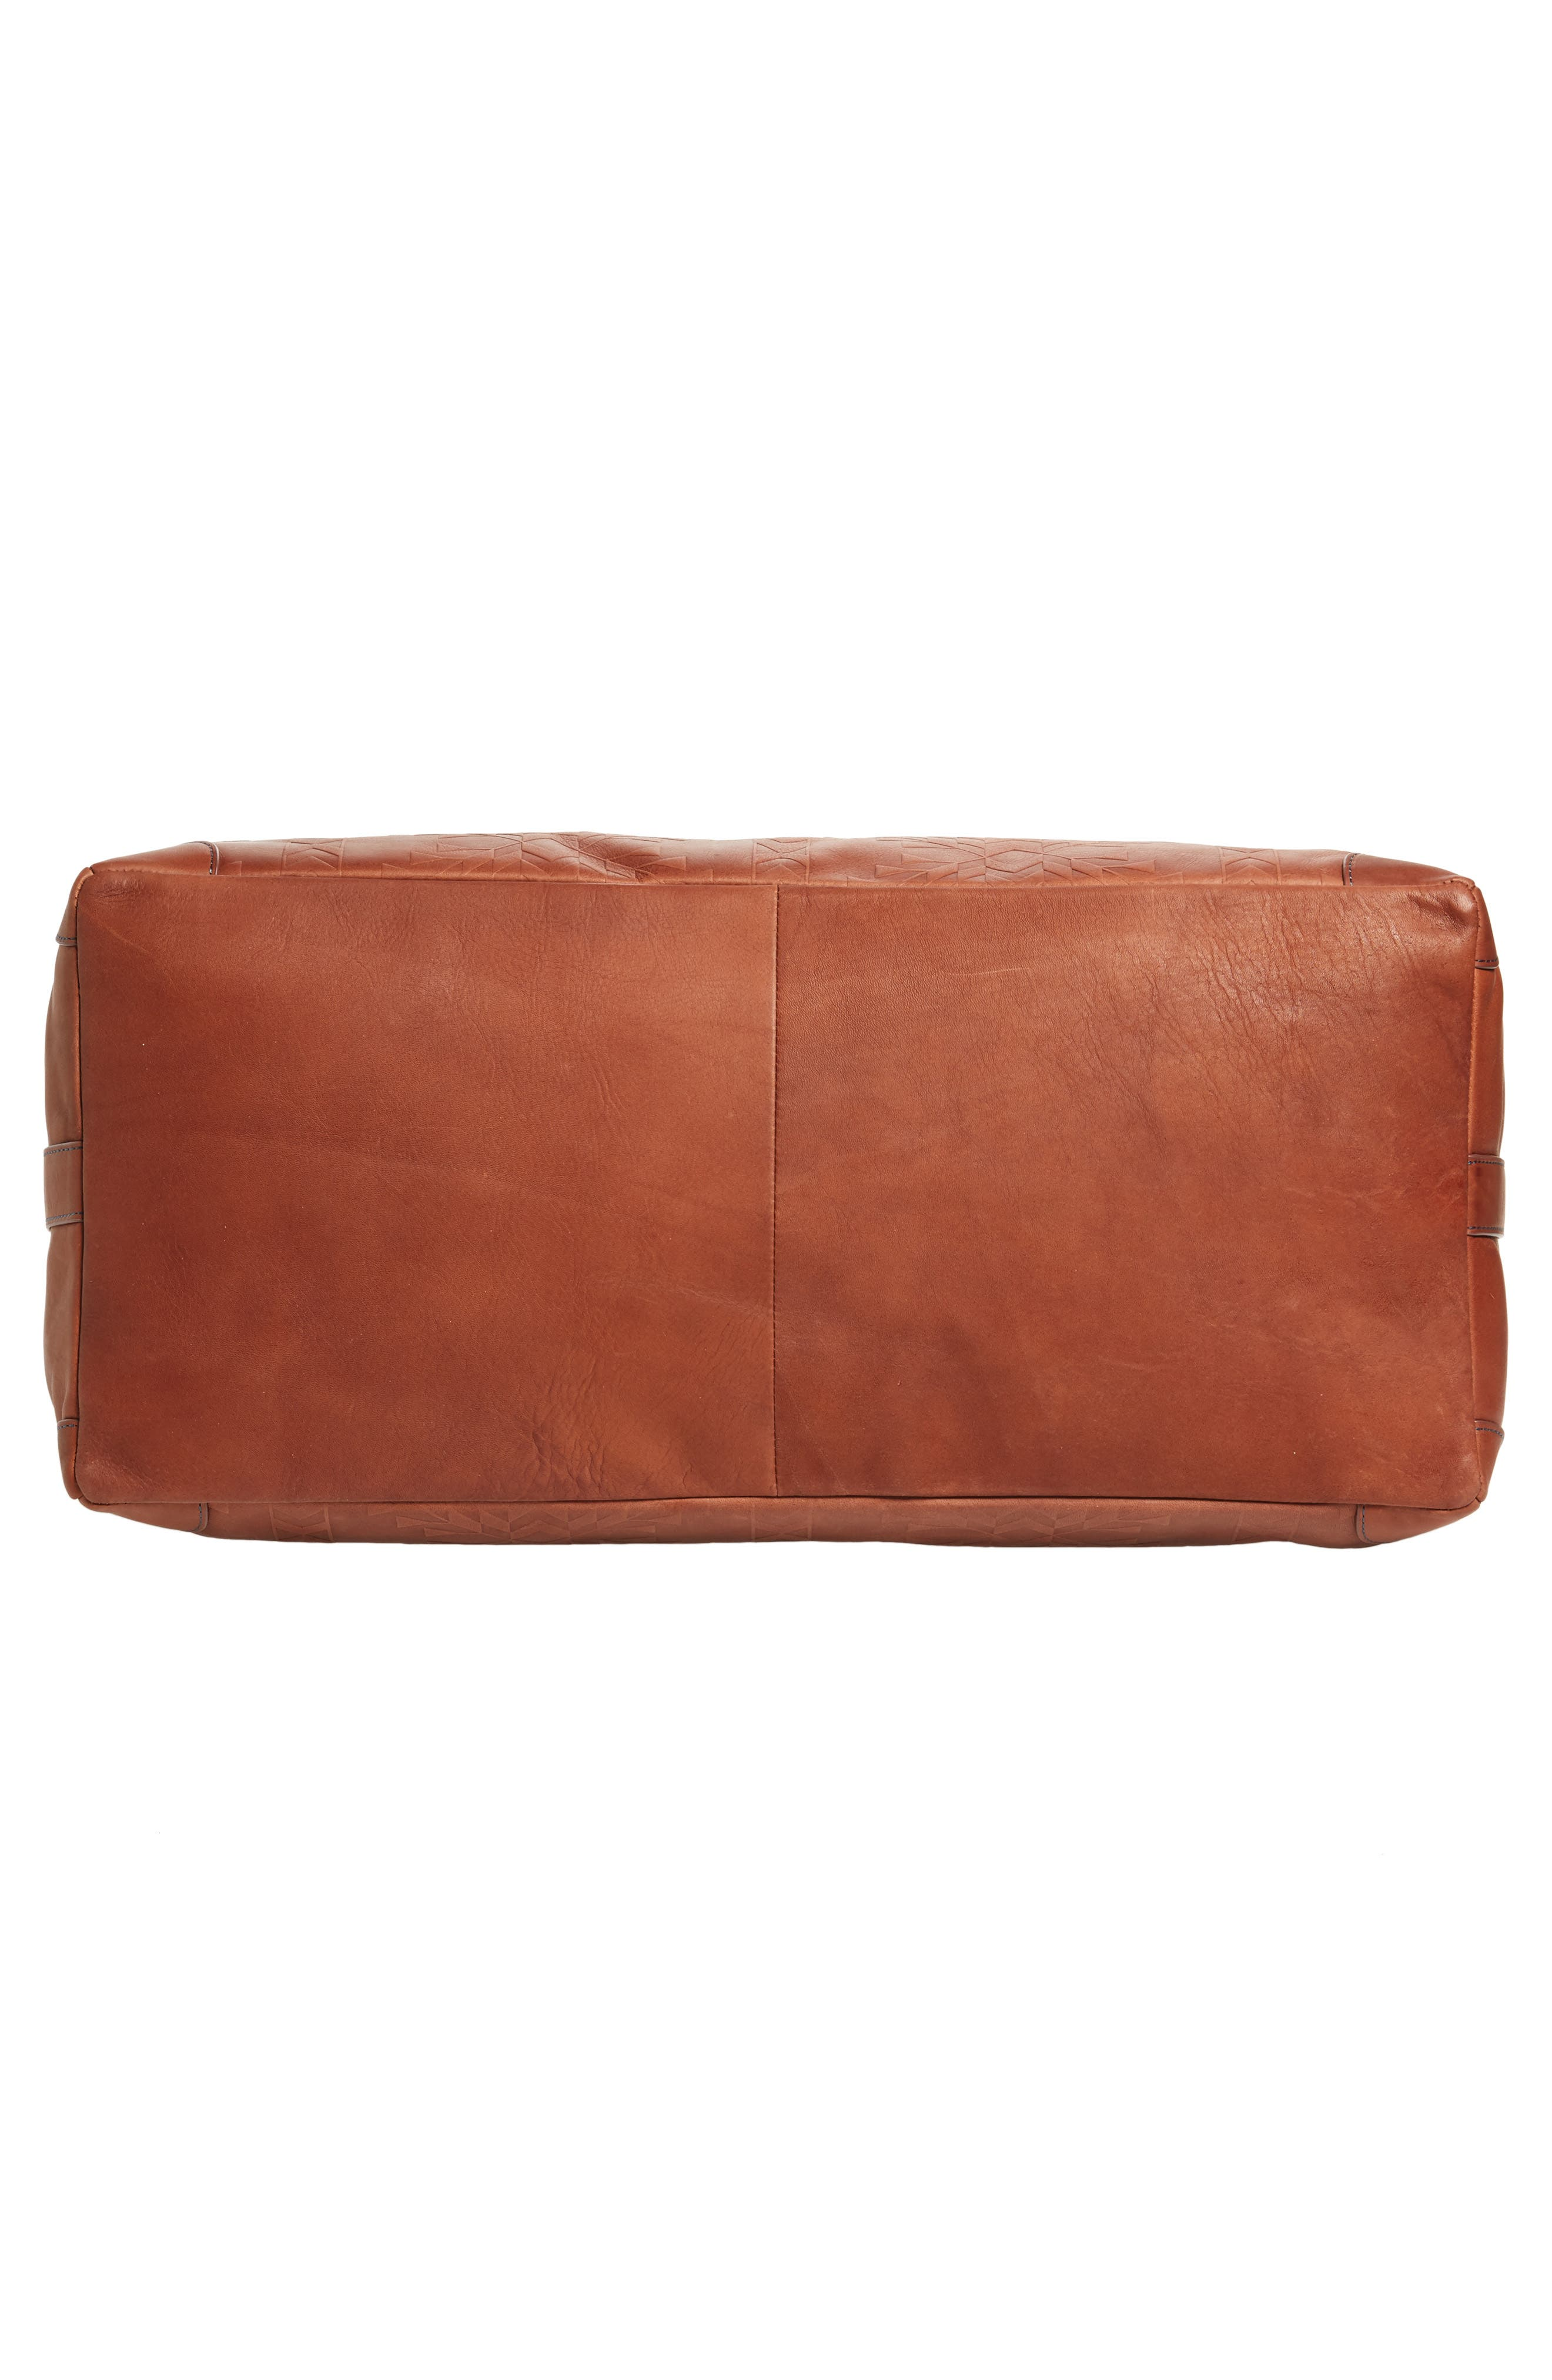 Voyager Duffel Bag,                             Alternate thumbnail 6, color,                             200